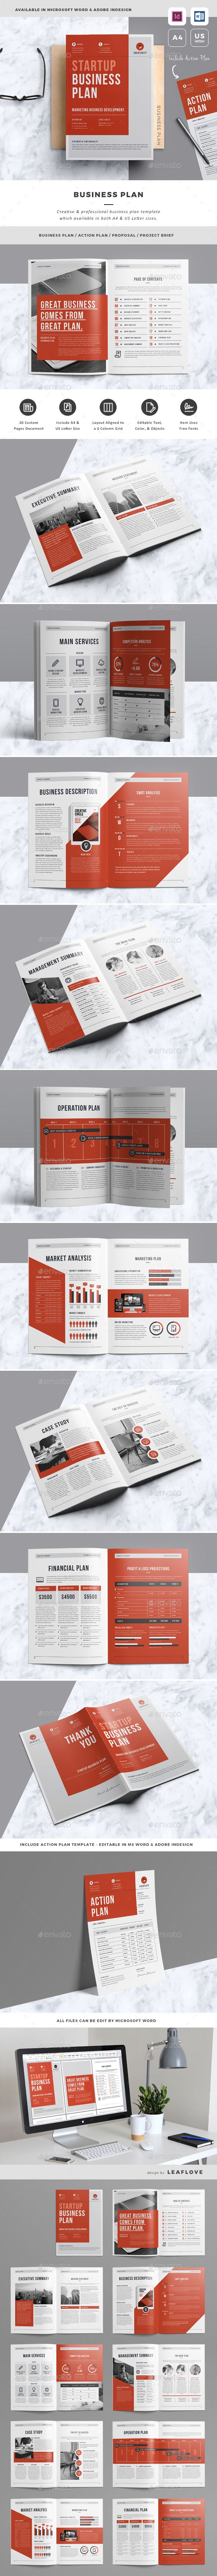 Business Plan — InDesign INDD #presentation #design • Download ➝ https://graphicriver.net/item/business-plan/19540224?ref=pxcr